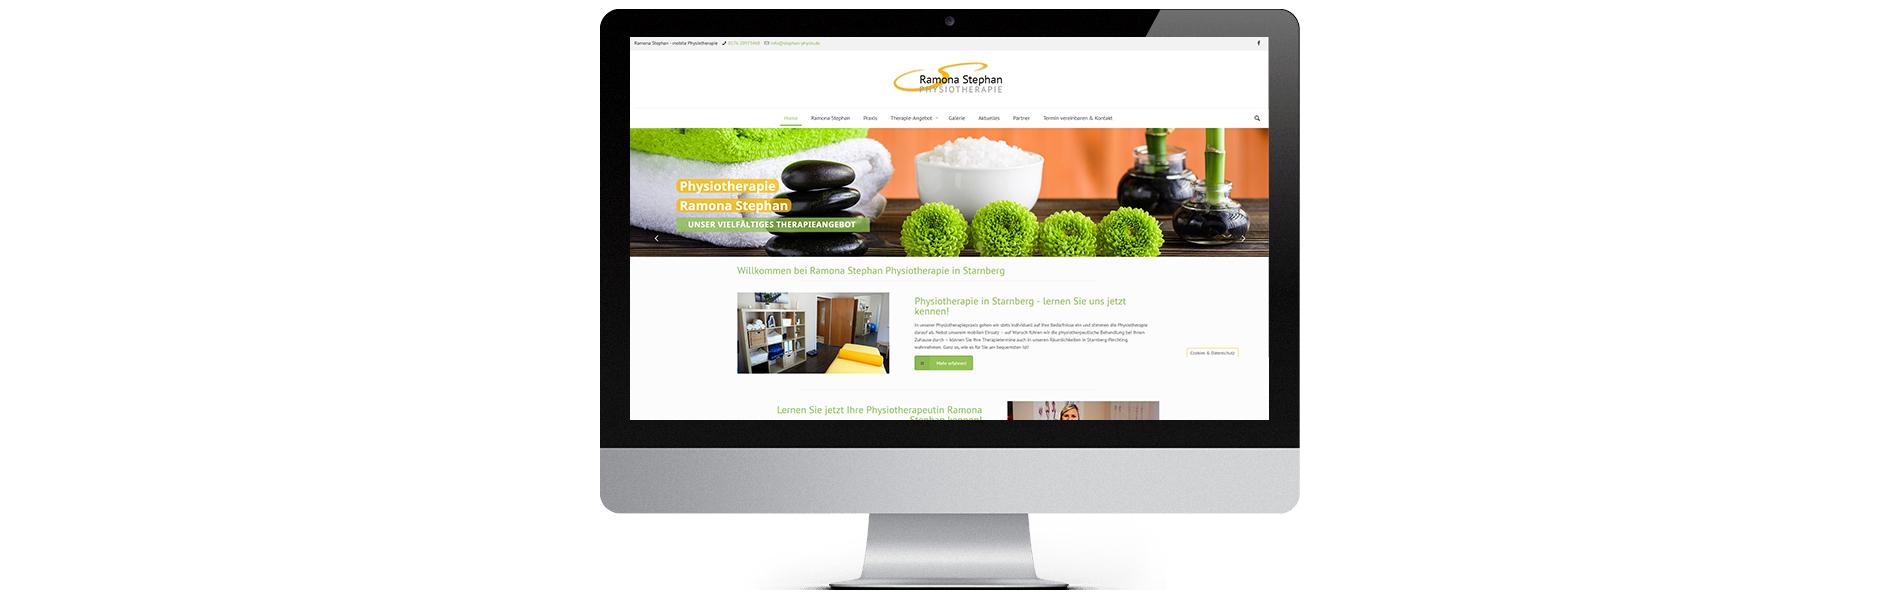 Projekt: Website Stephan Physio